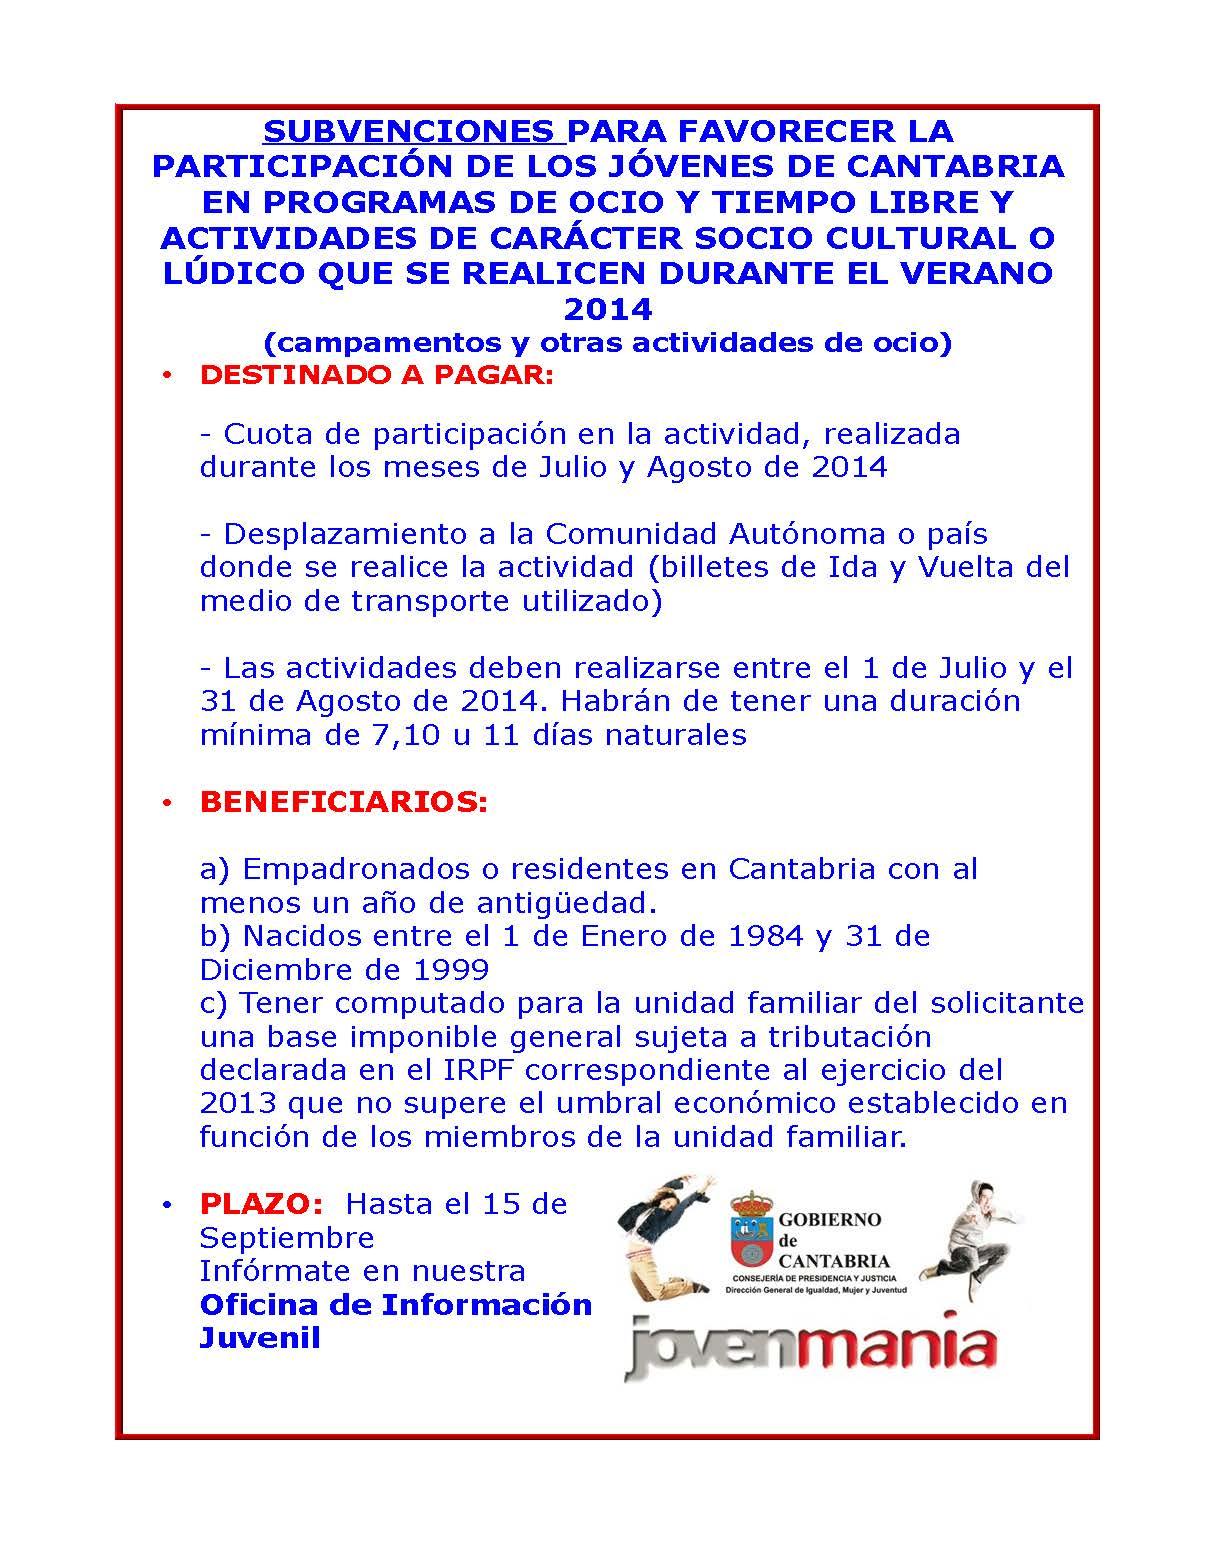 http://www.cabezondelasal.net/wp-content/uploads/2014/07/Subvenciones-actividades.jpg